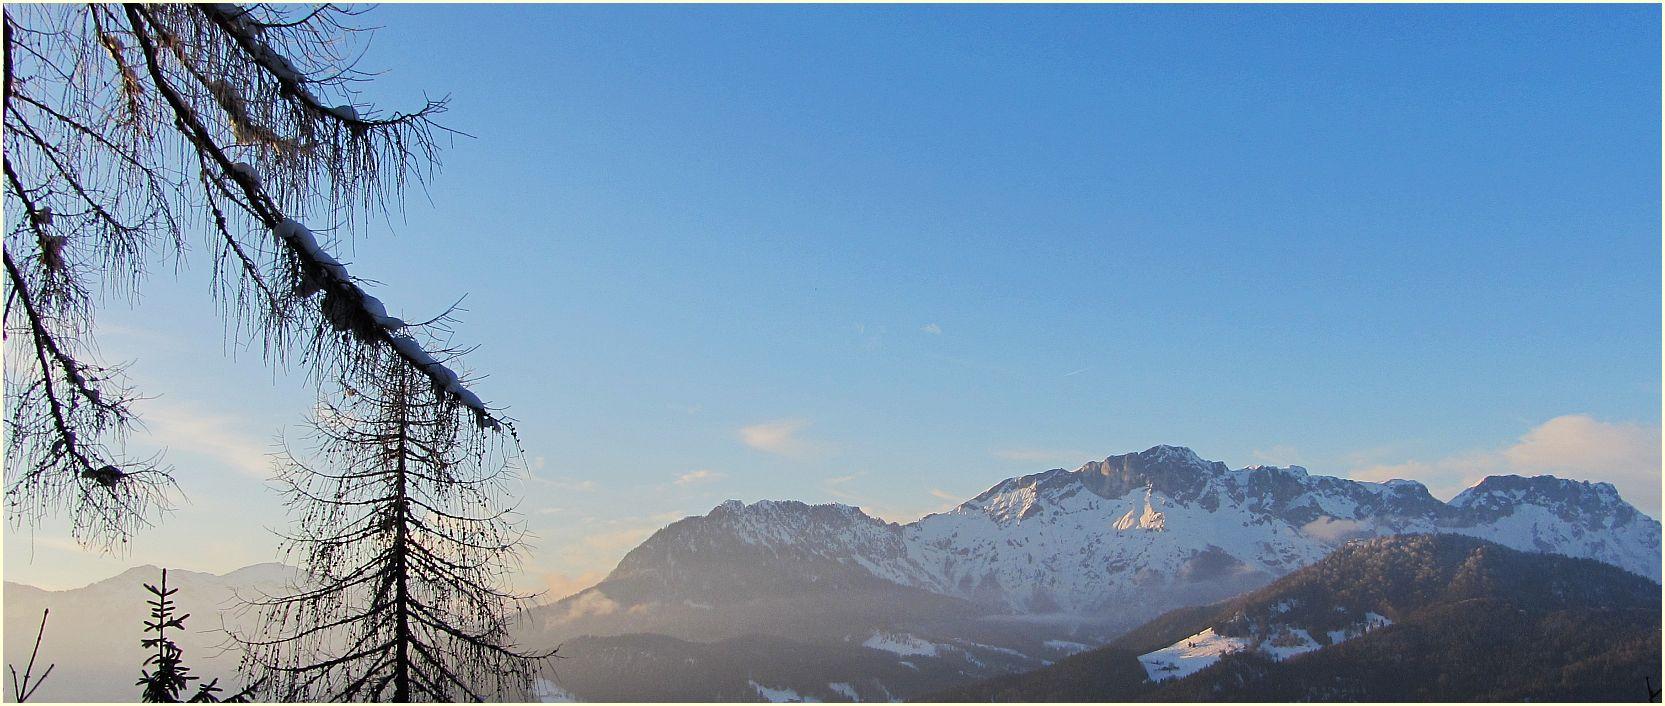 Bergkette über Berchtesgaden...